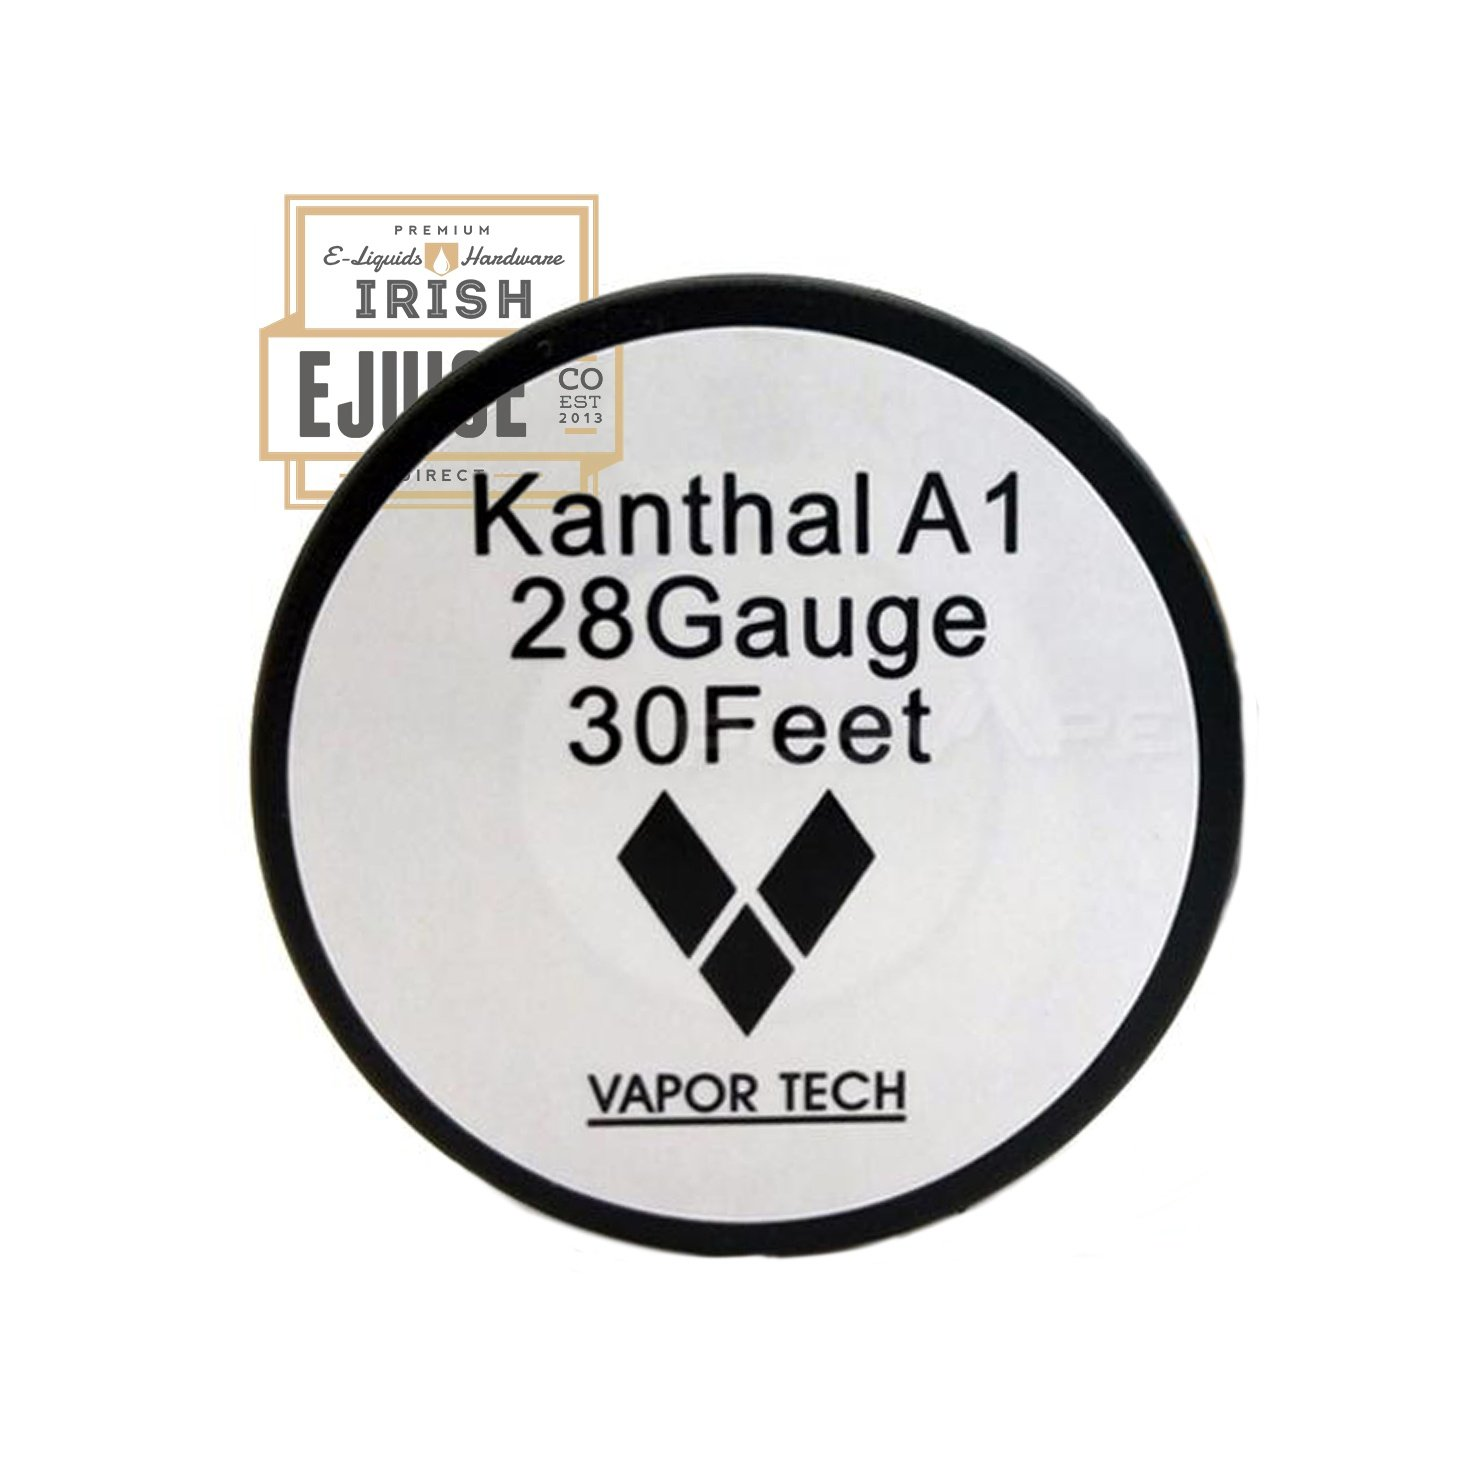 Authentic Mkws Alien Wire Kanthal A1 15feet Premium Coil Vape Vapor Avocado Ni80 Mod Rda Rta Rdta Nichrome 80 Source